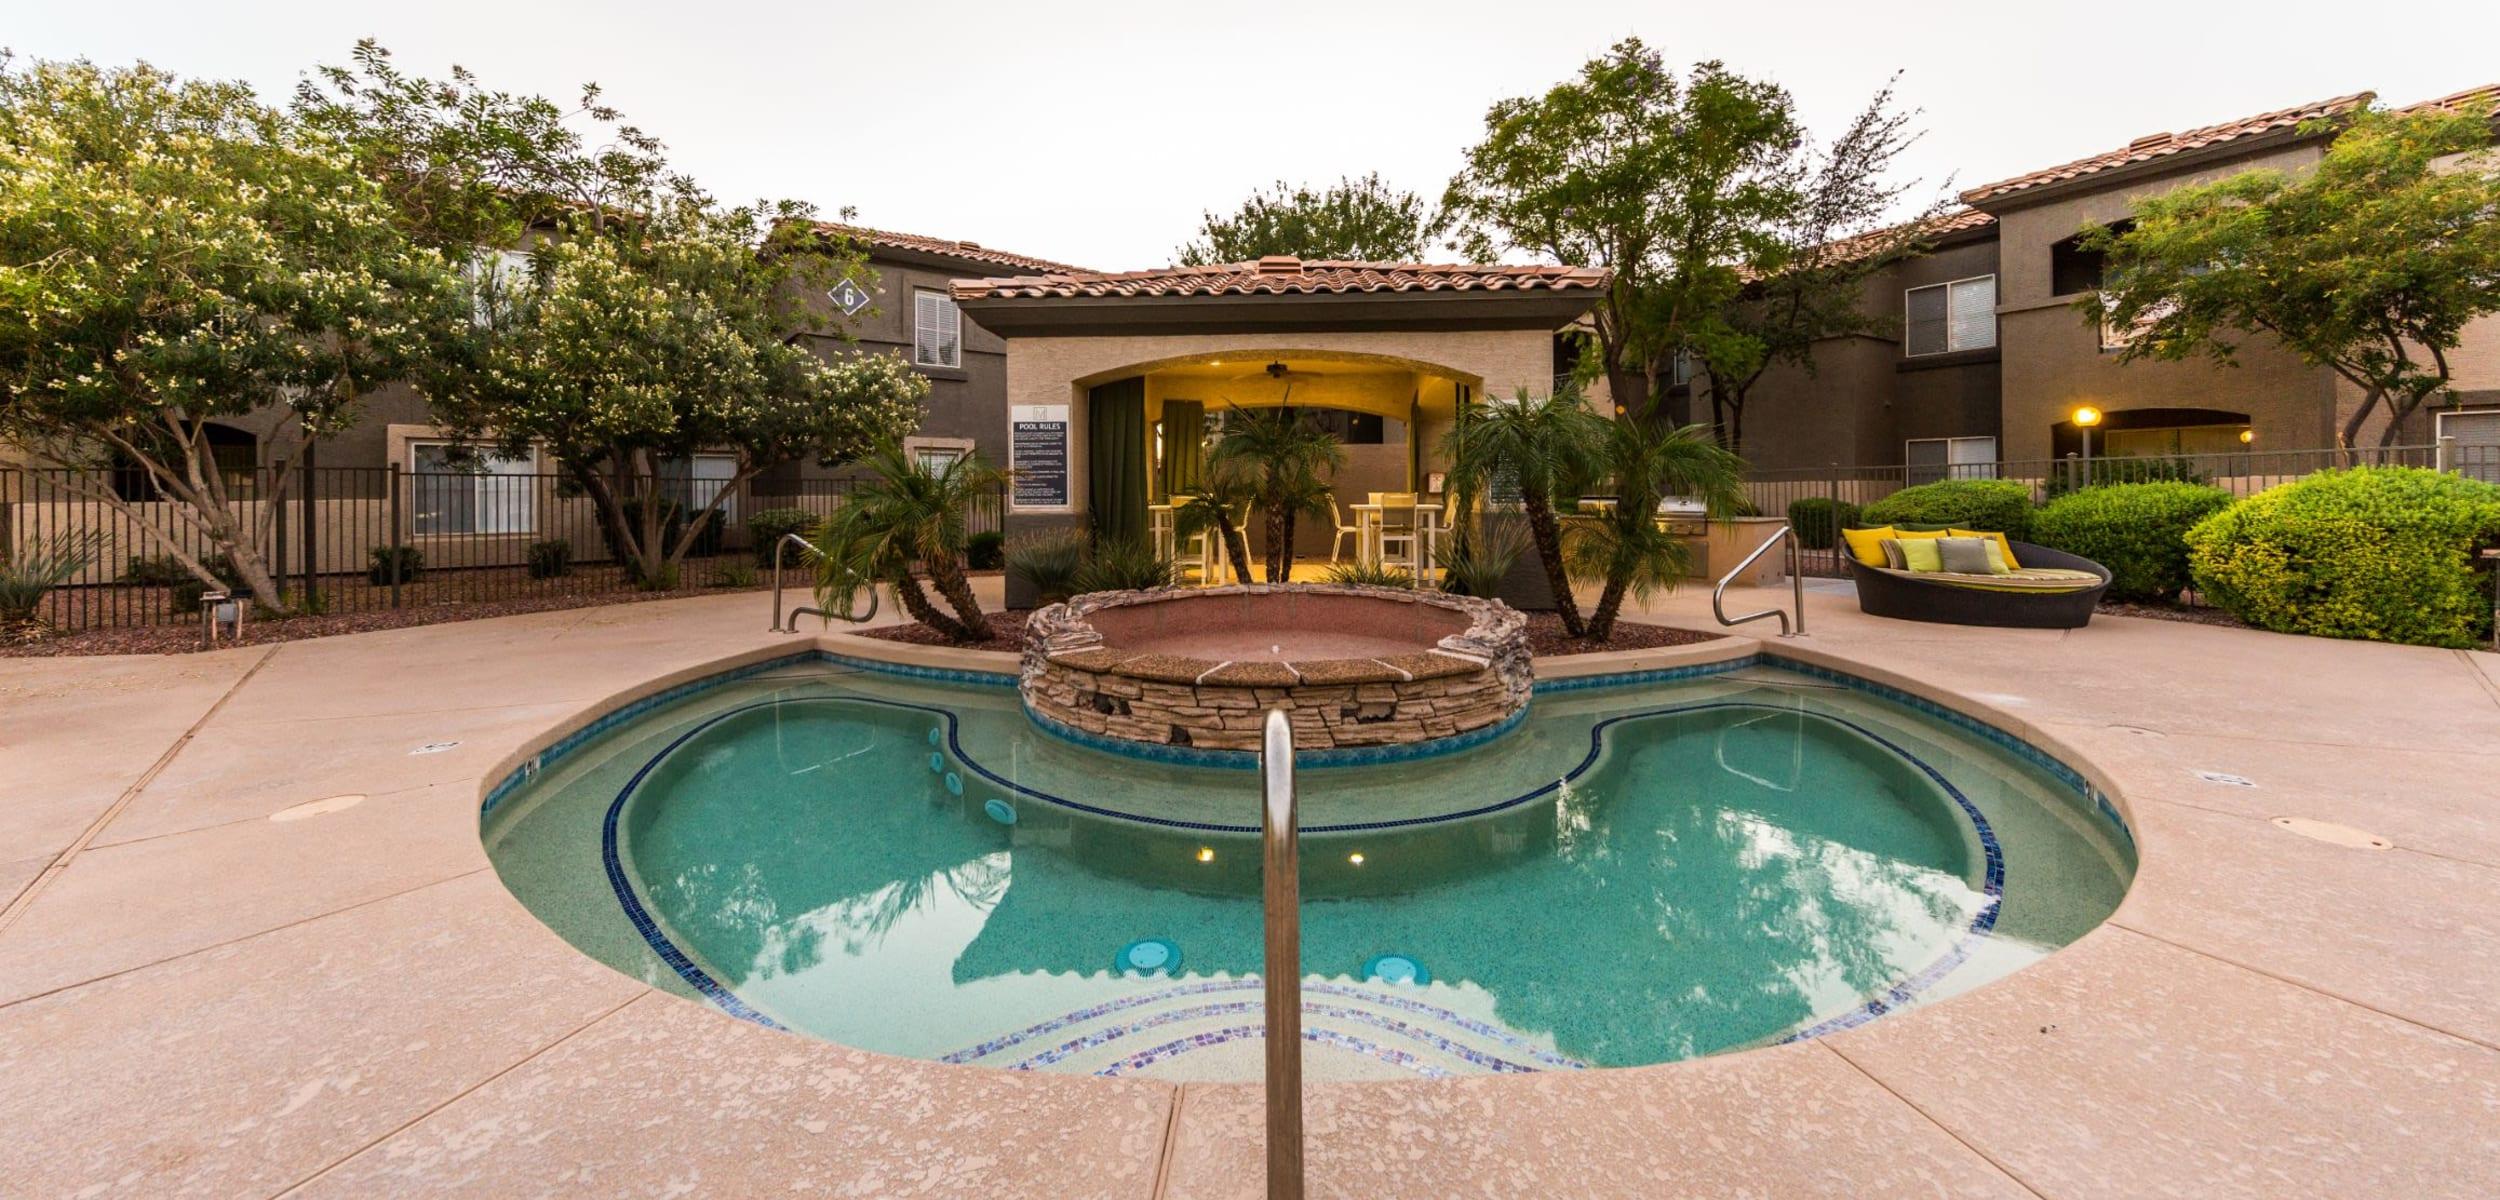 Outdoor spa at Marquis at Arrowhead in Peoria Arizona,